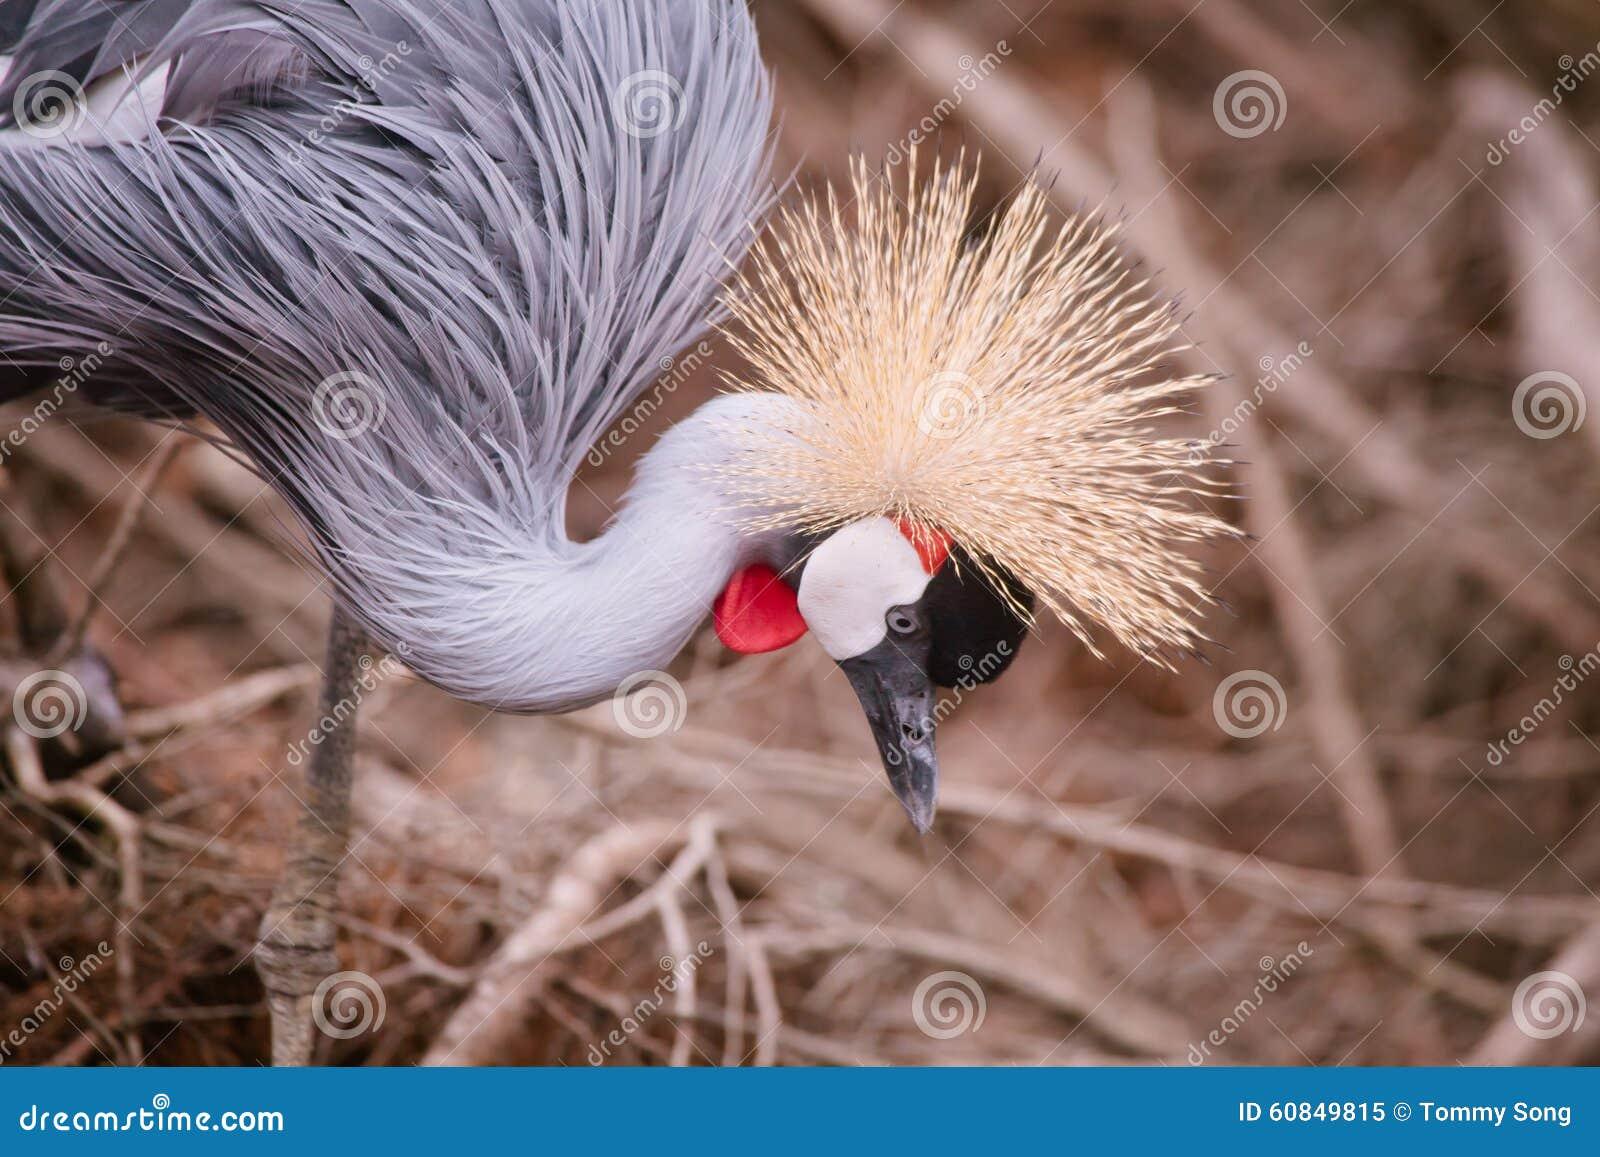 Crowned crane close up